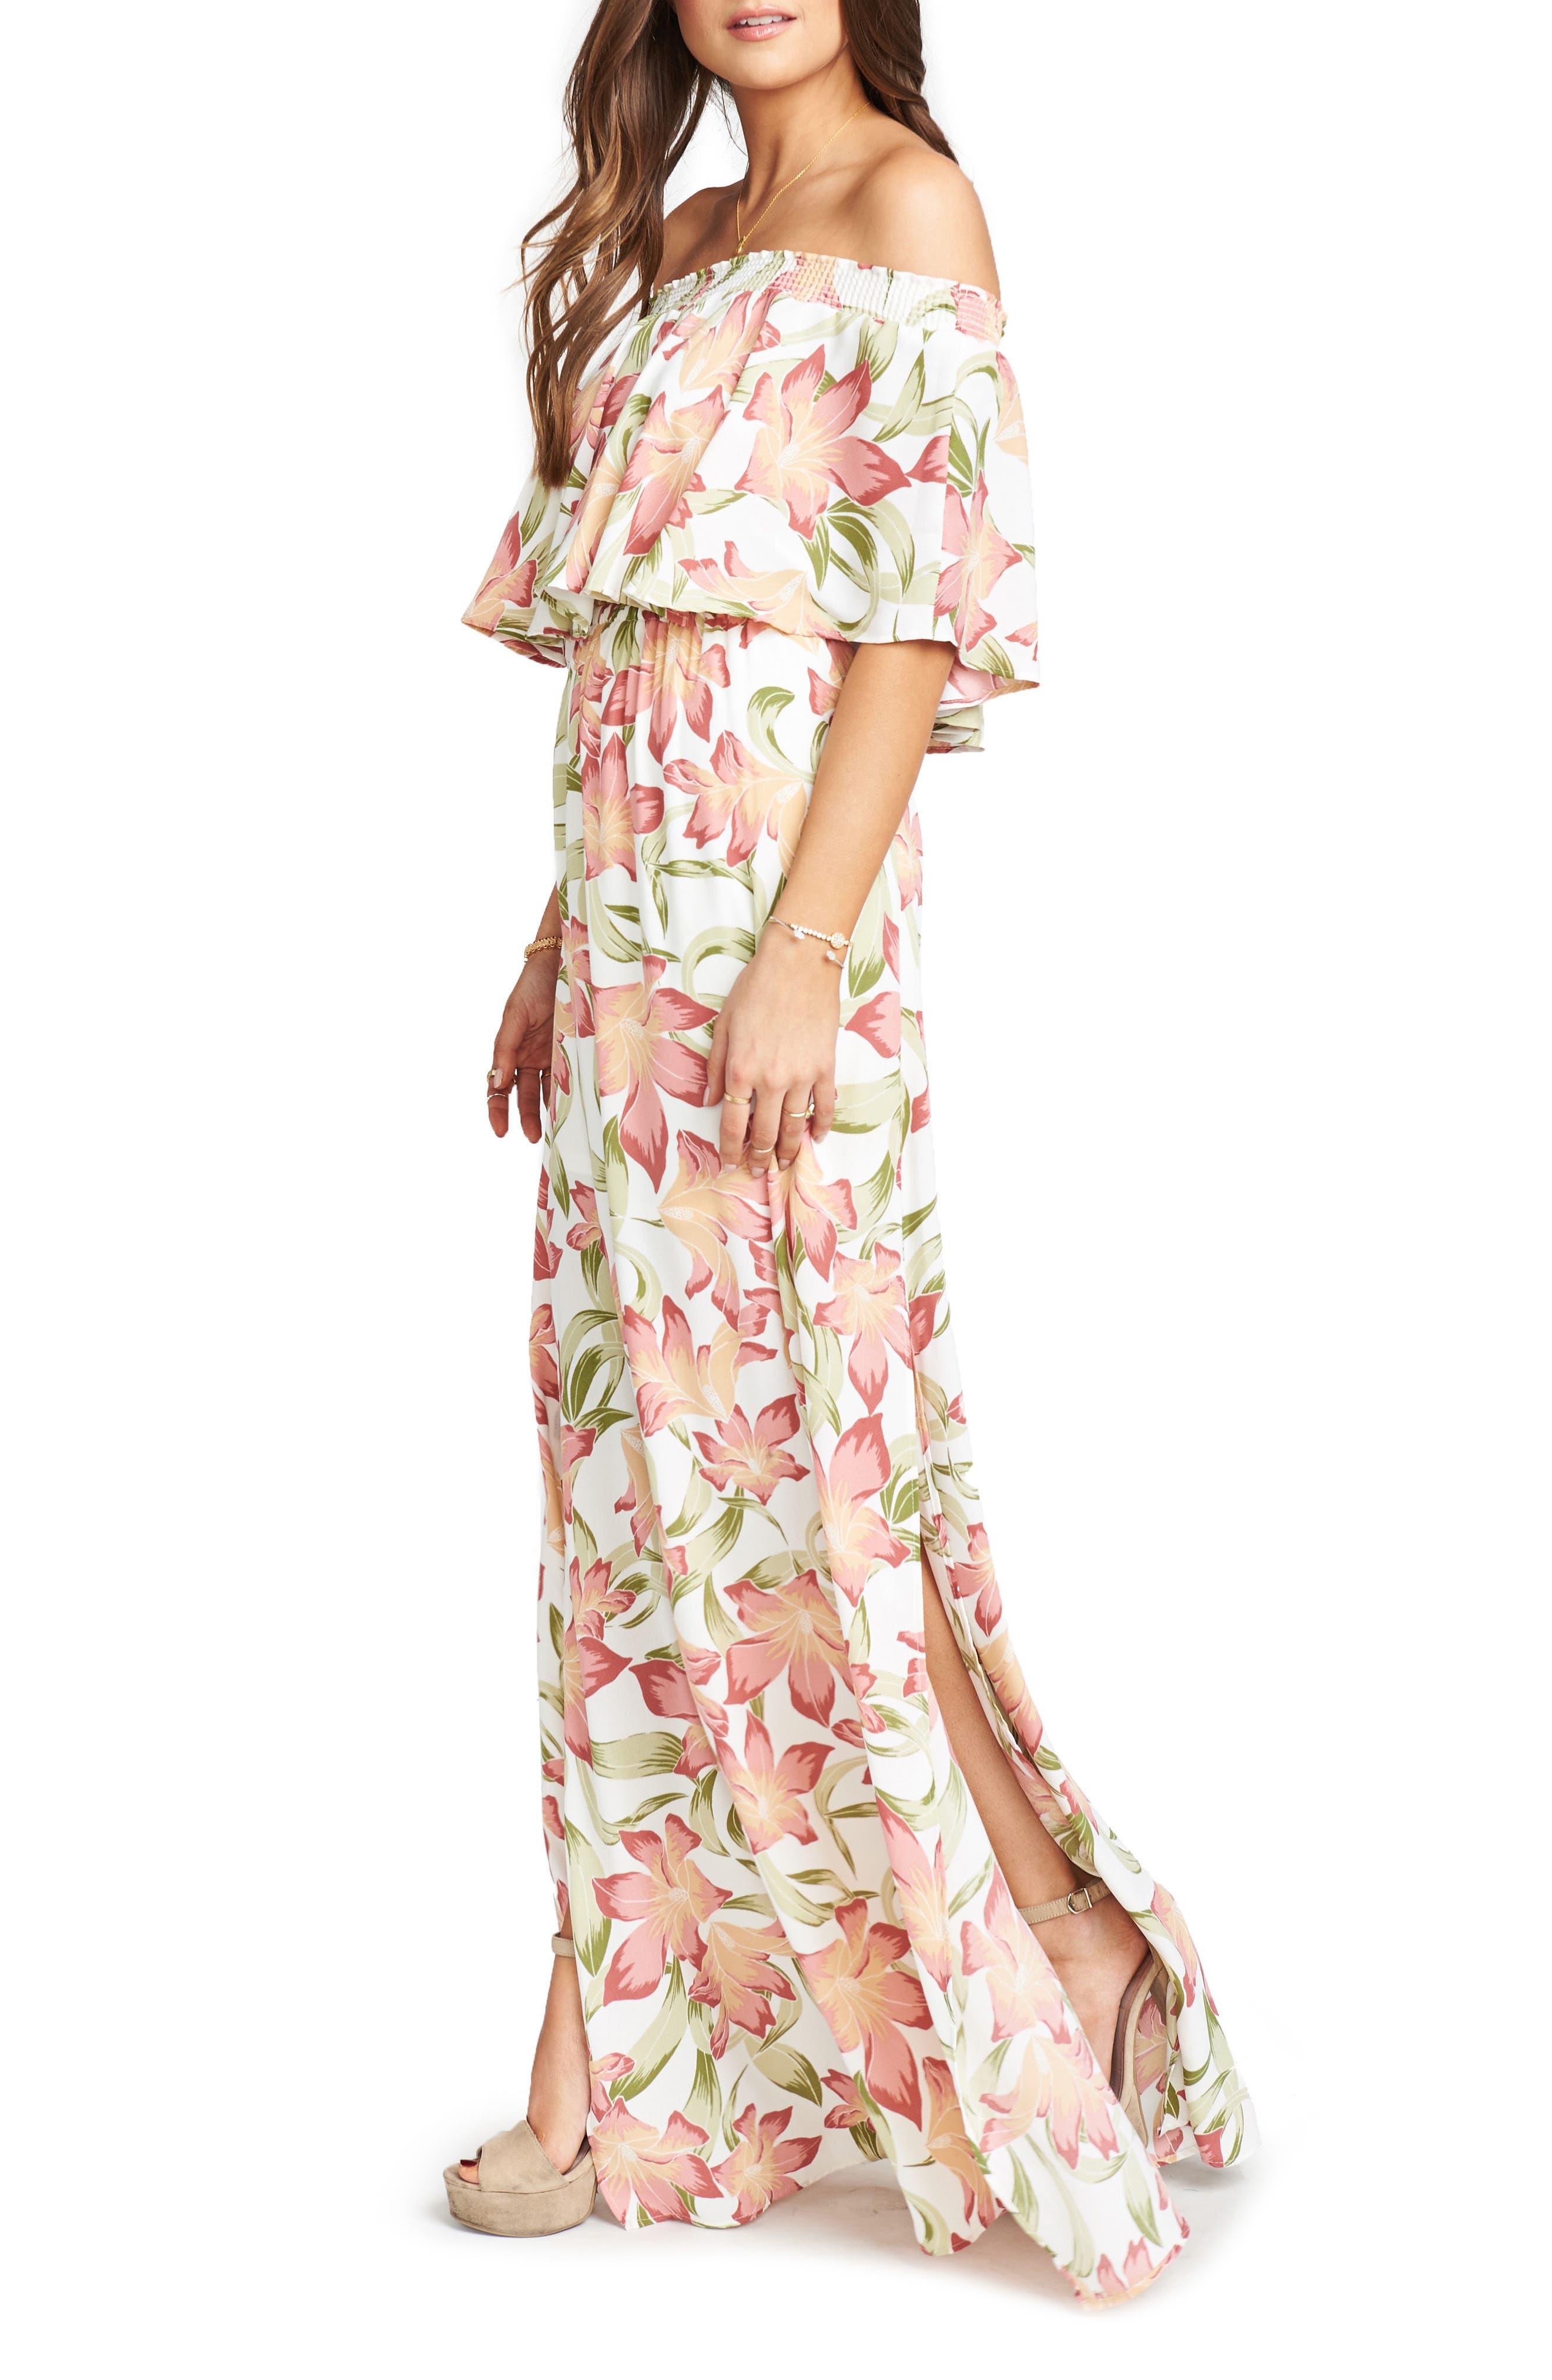 Hacienda Maxi Dress,                             Alternate thumbnail 3, color,                             Lily Lady Crepe